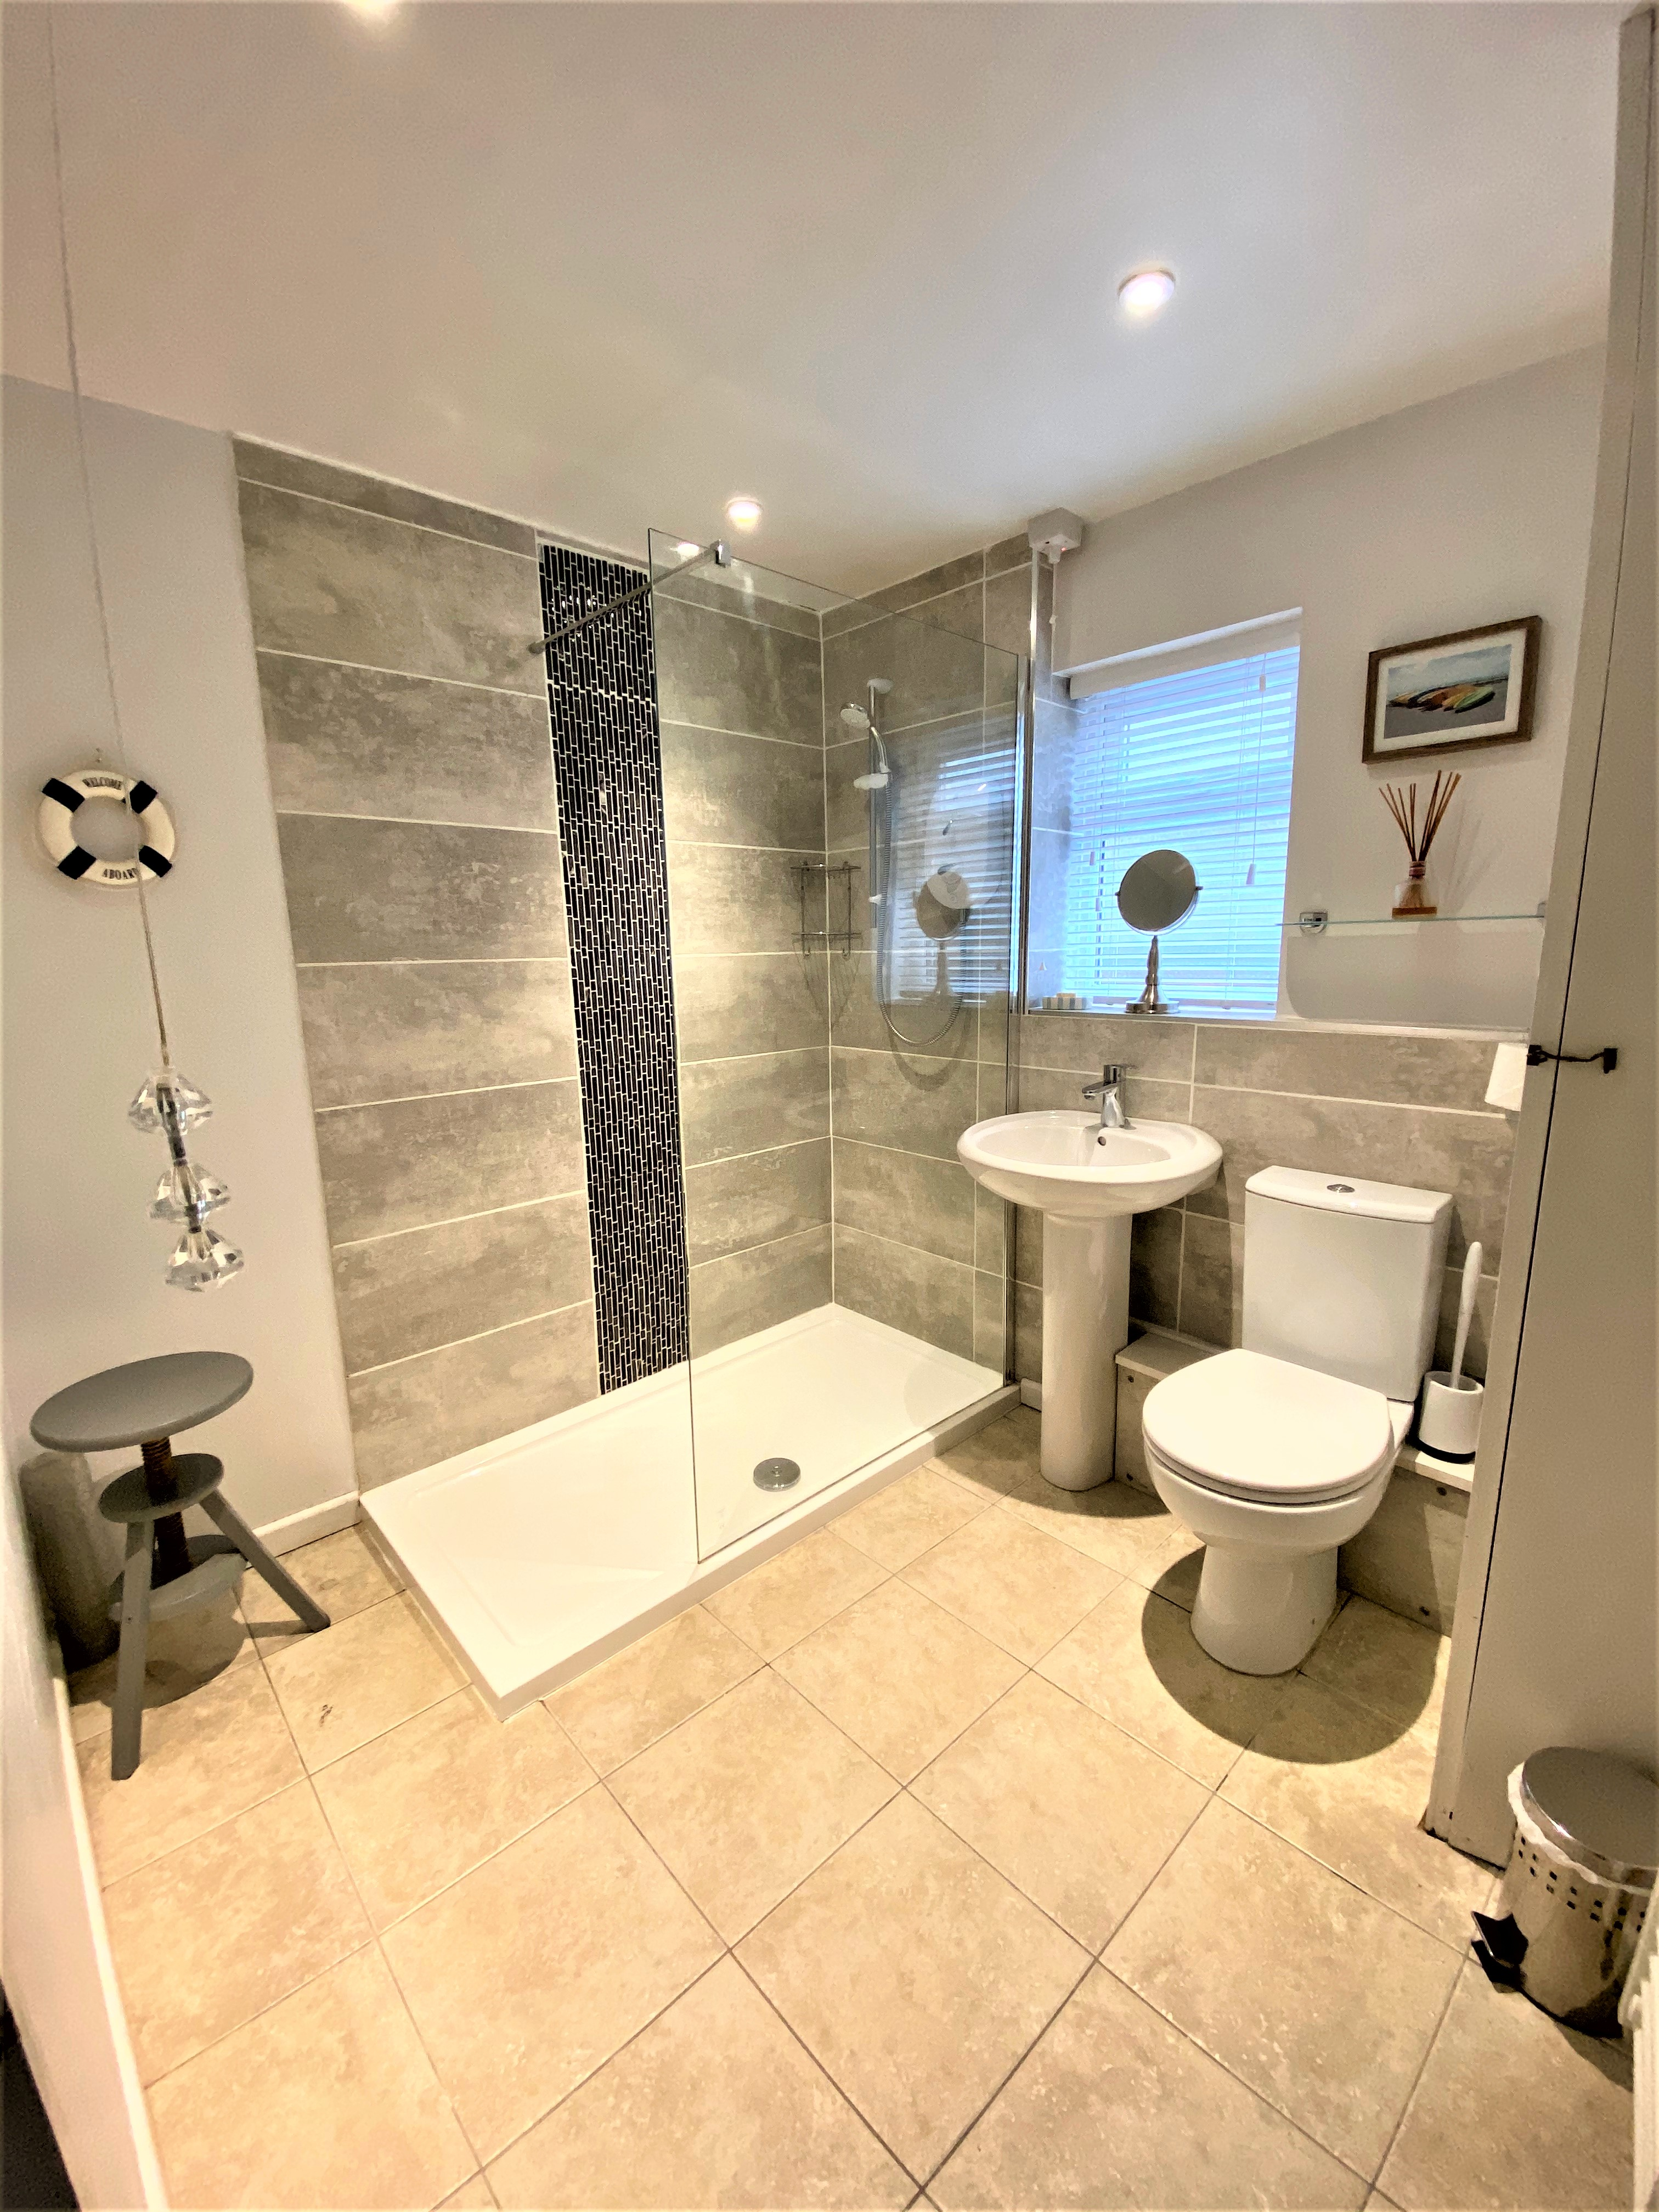 NEW pic of bathroom